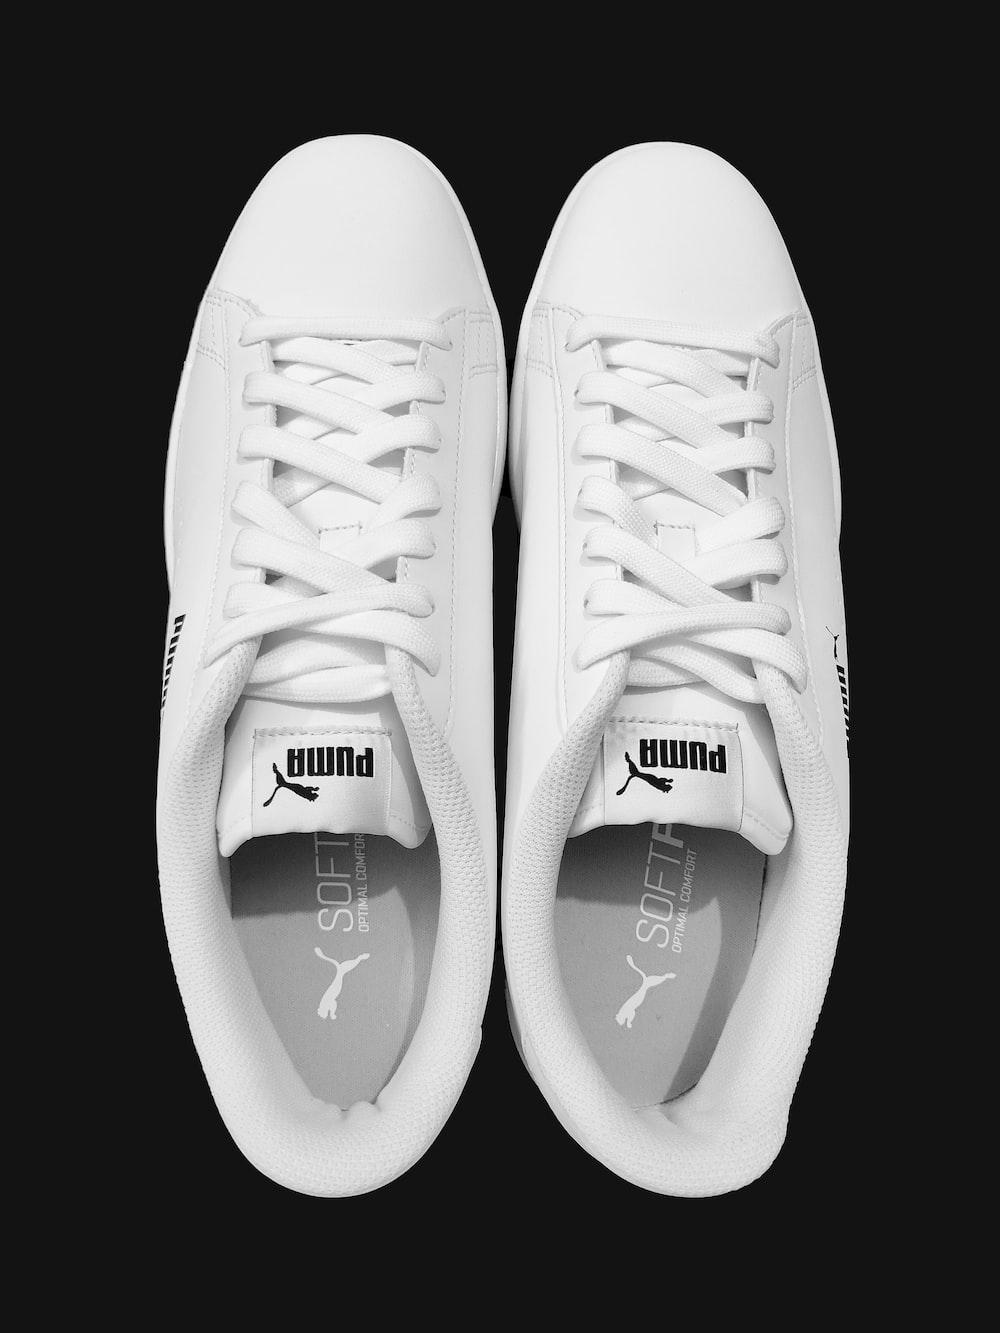 white adidas yeezy boost 350